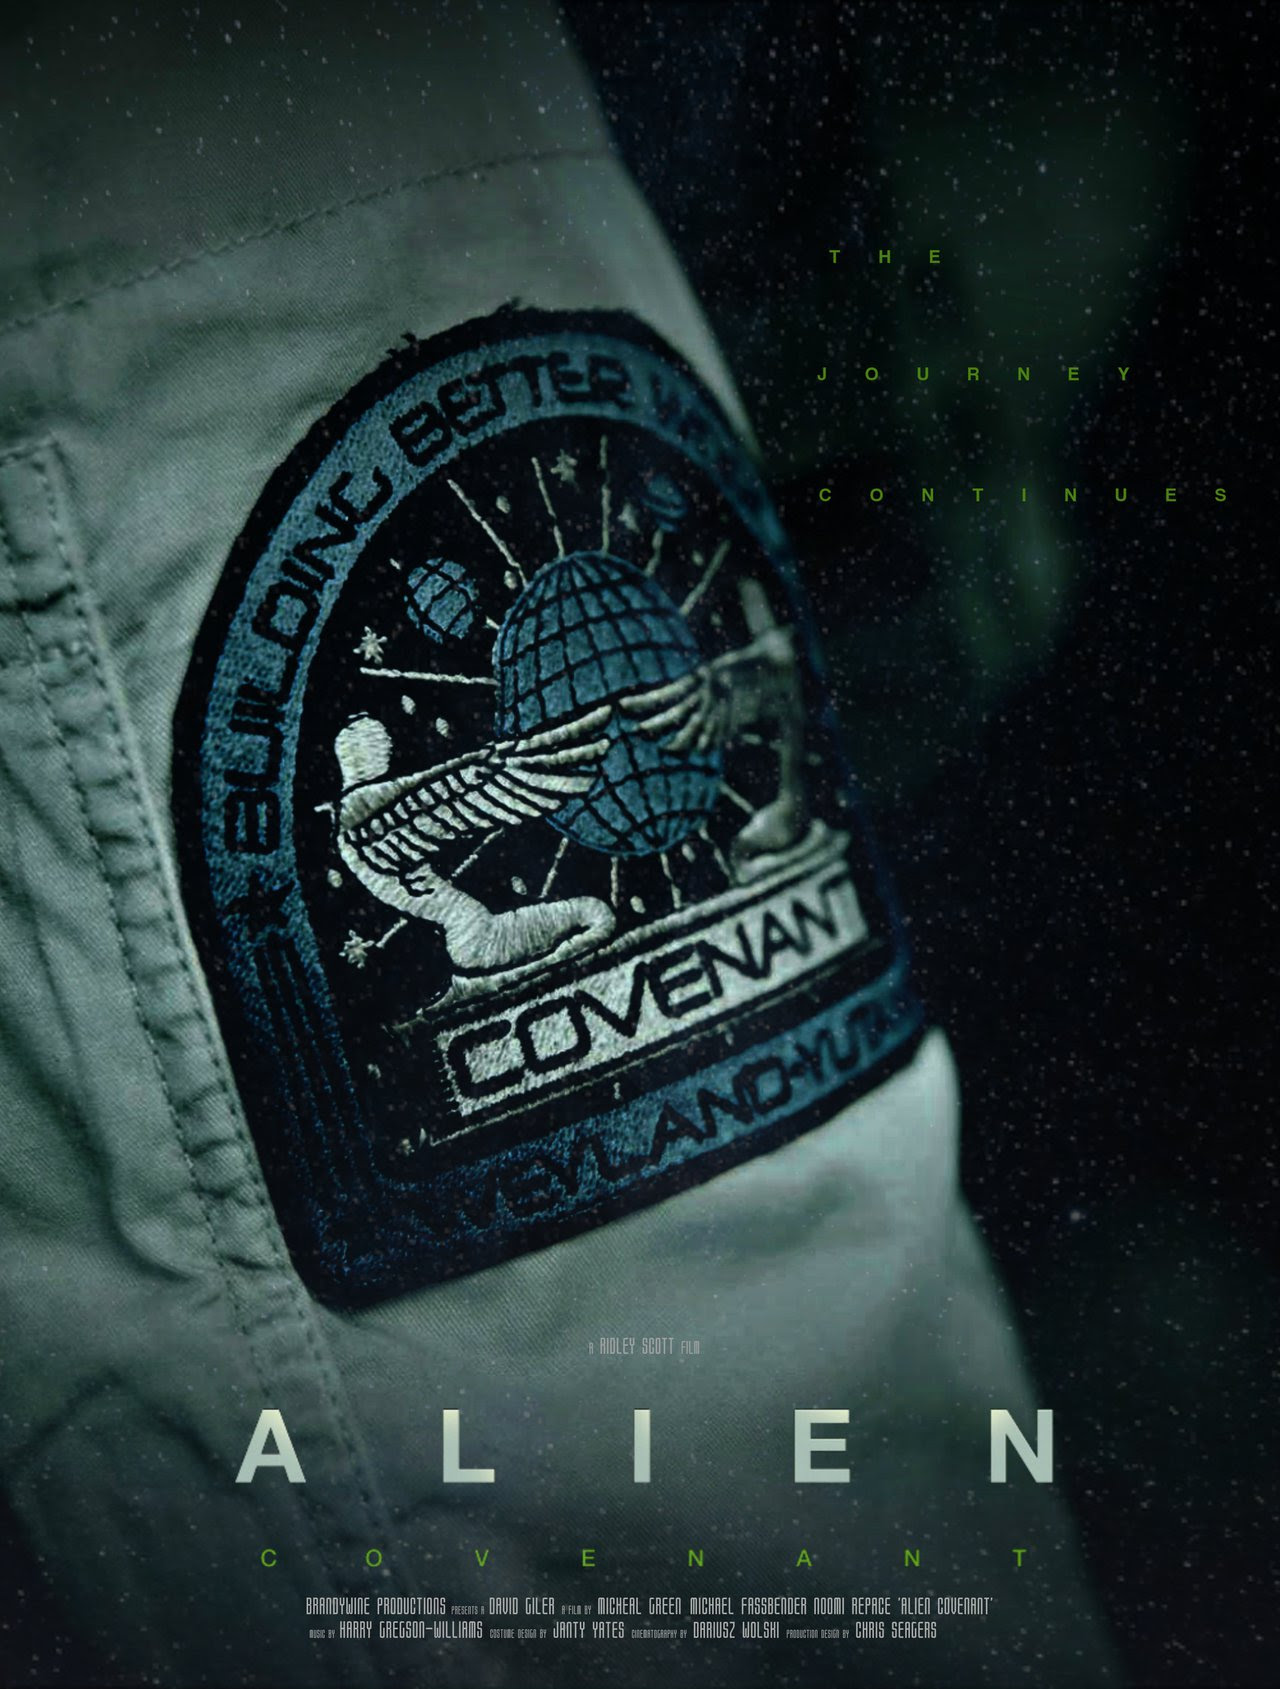 Resultado de imagem para Alien: Covenant posters